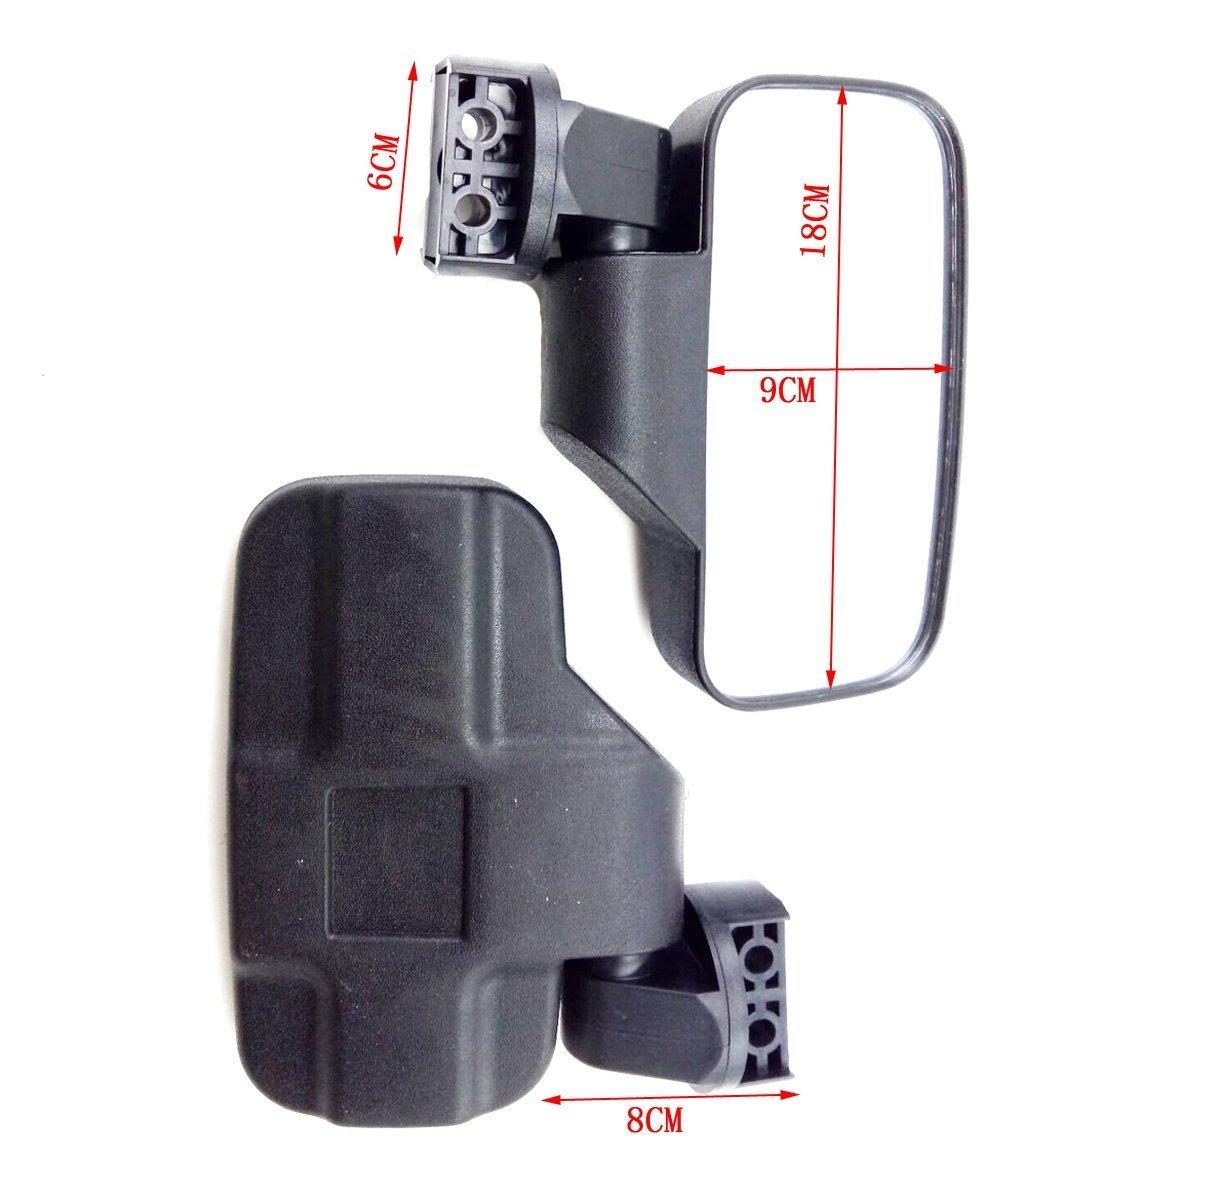 Can Am Commander OKSTNO UTV Adjustable Side Mirror Set 1.5-2 Backet for UTV RZR XP1000 RZR 900 John Deere Gators,Polaris Ranger RZR Gator Maverick Rhino